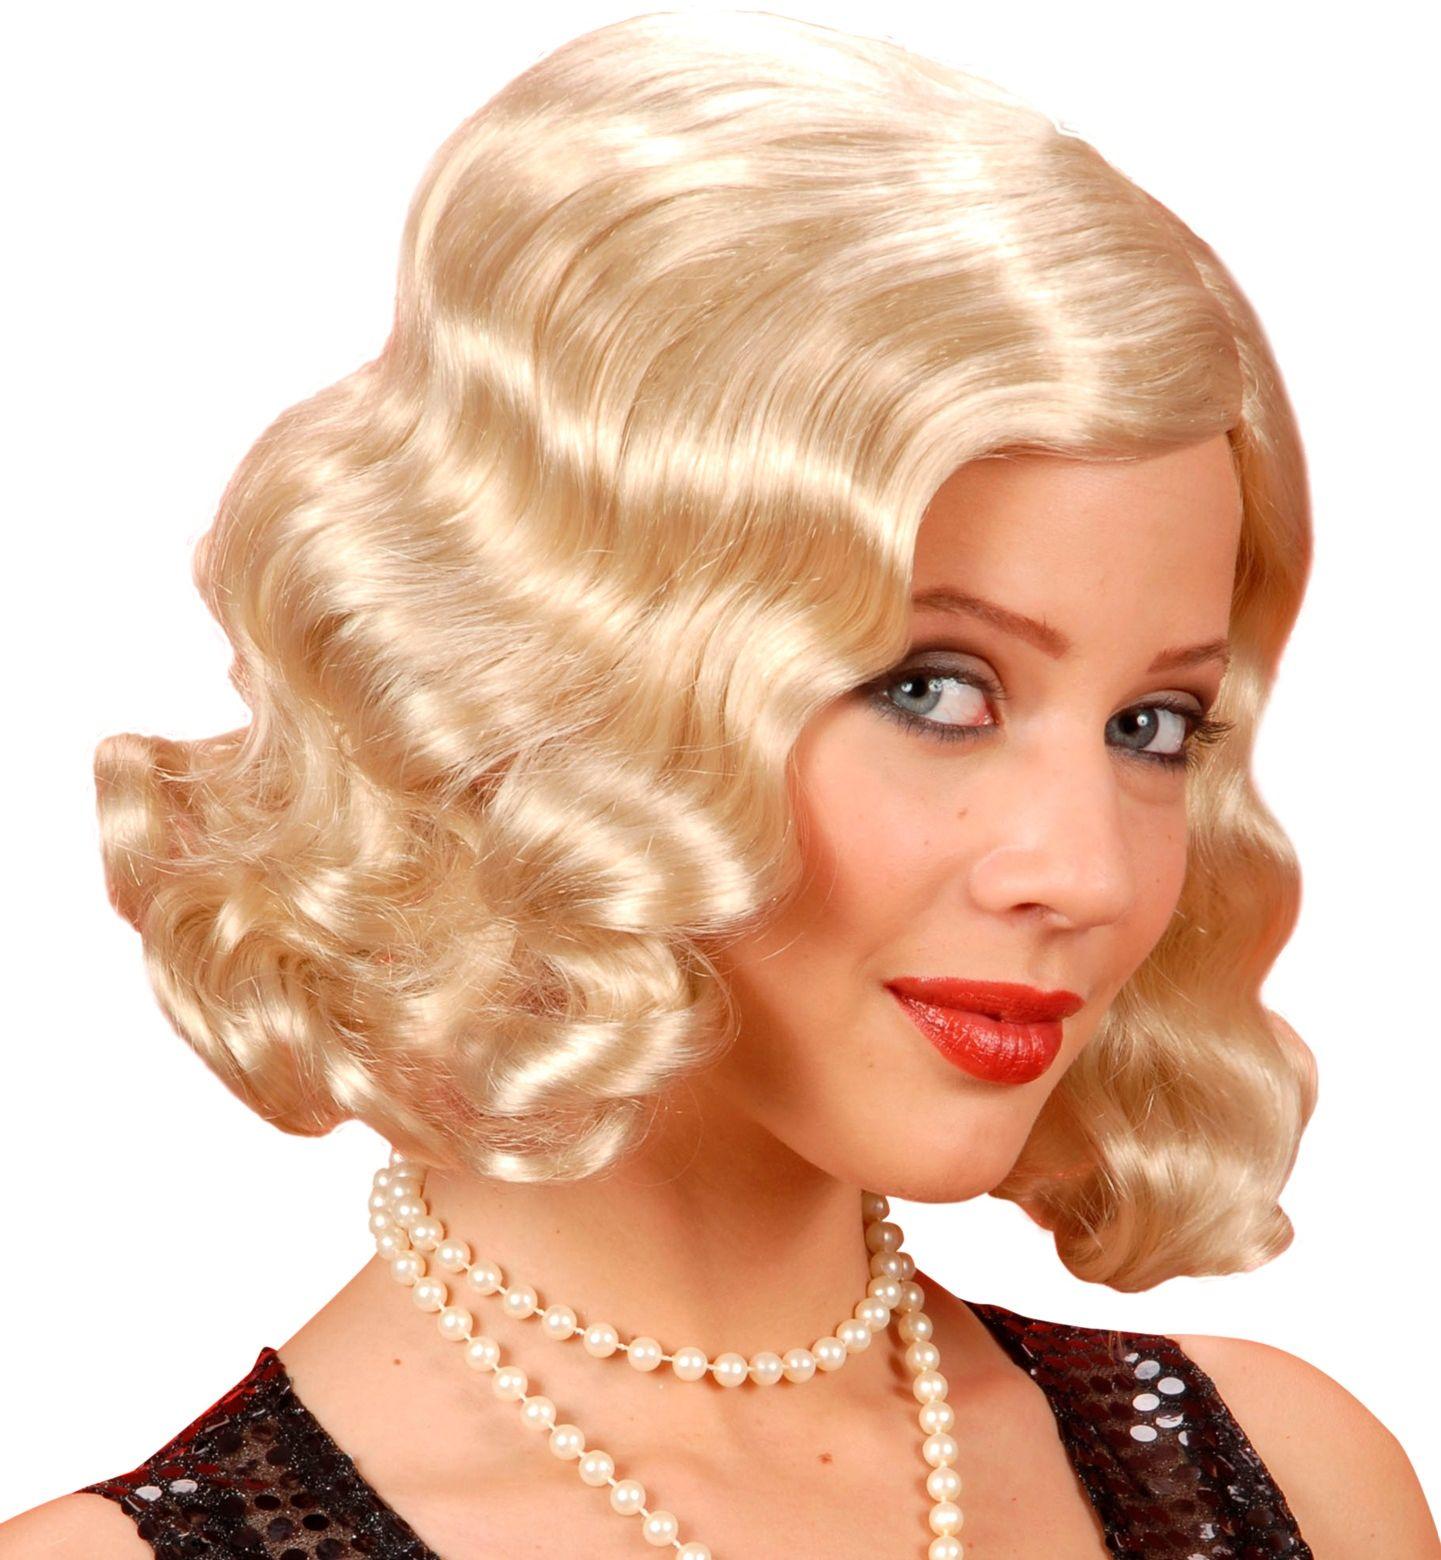 Jaren 20 blonde pruik